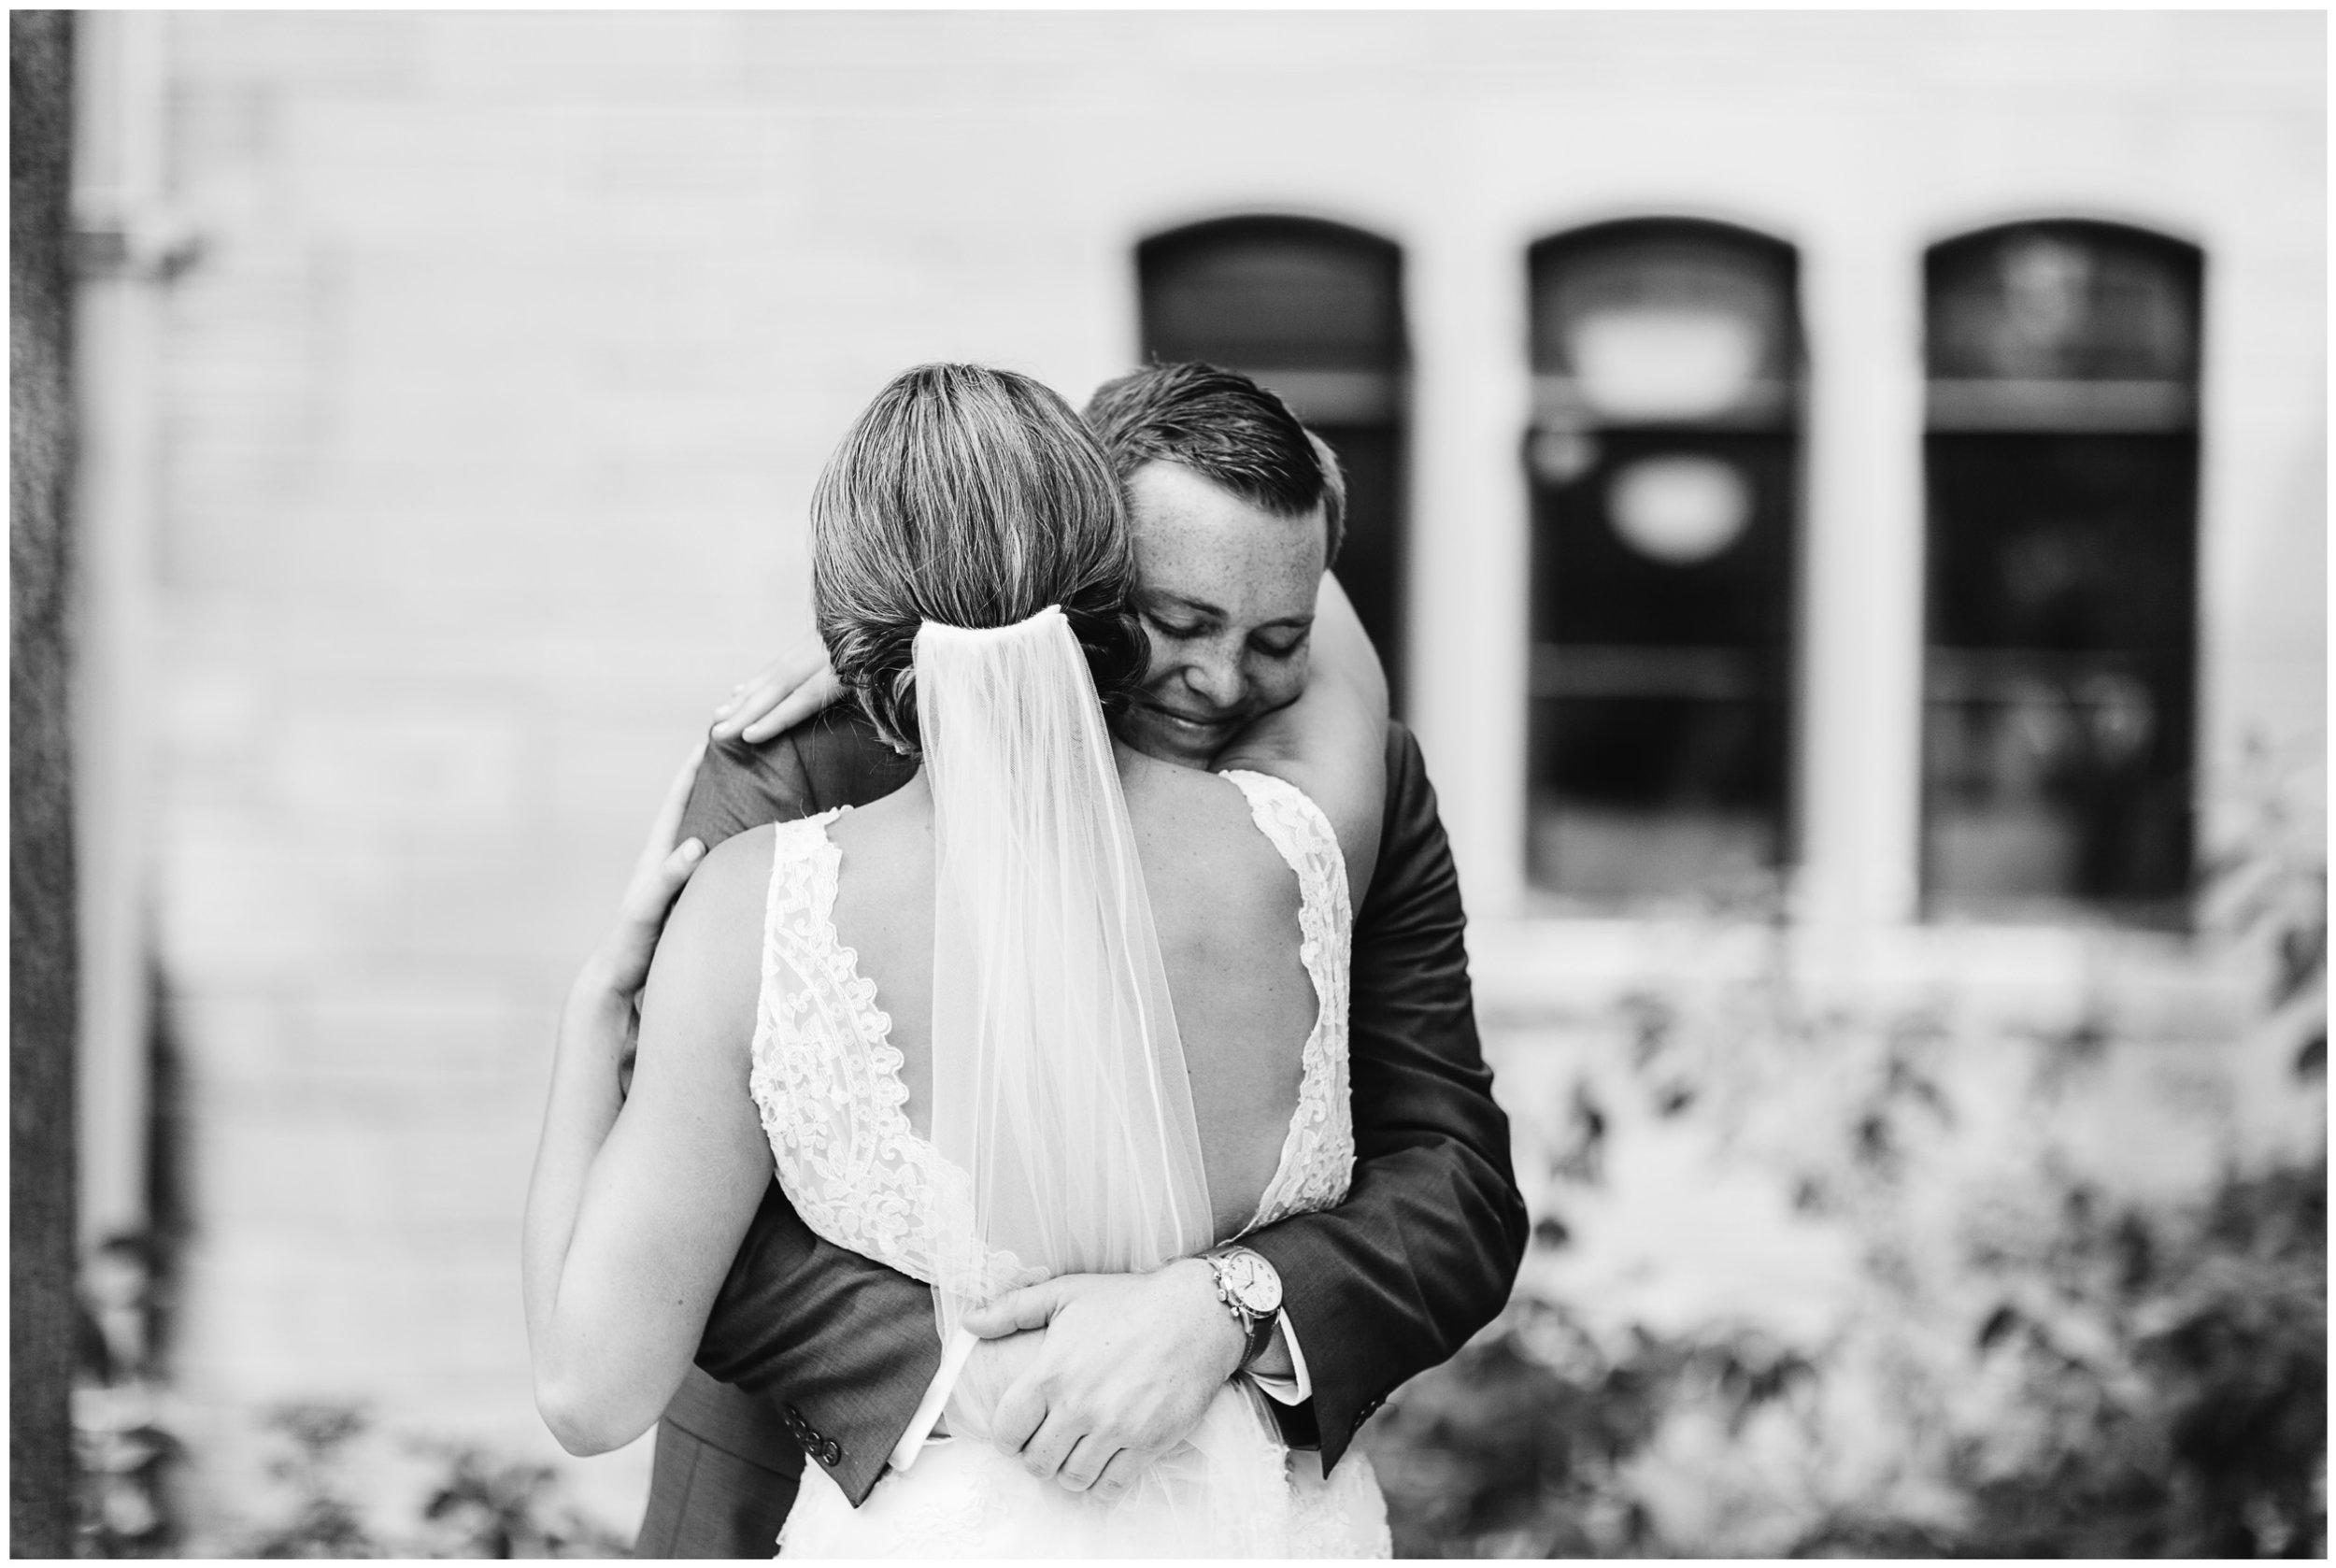 ann_arbor_michigan_wedding_34.jpg